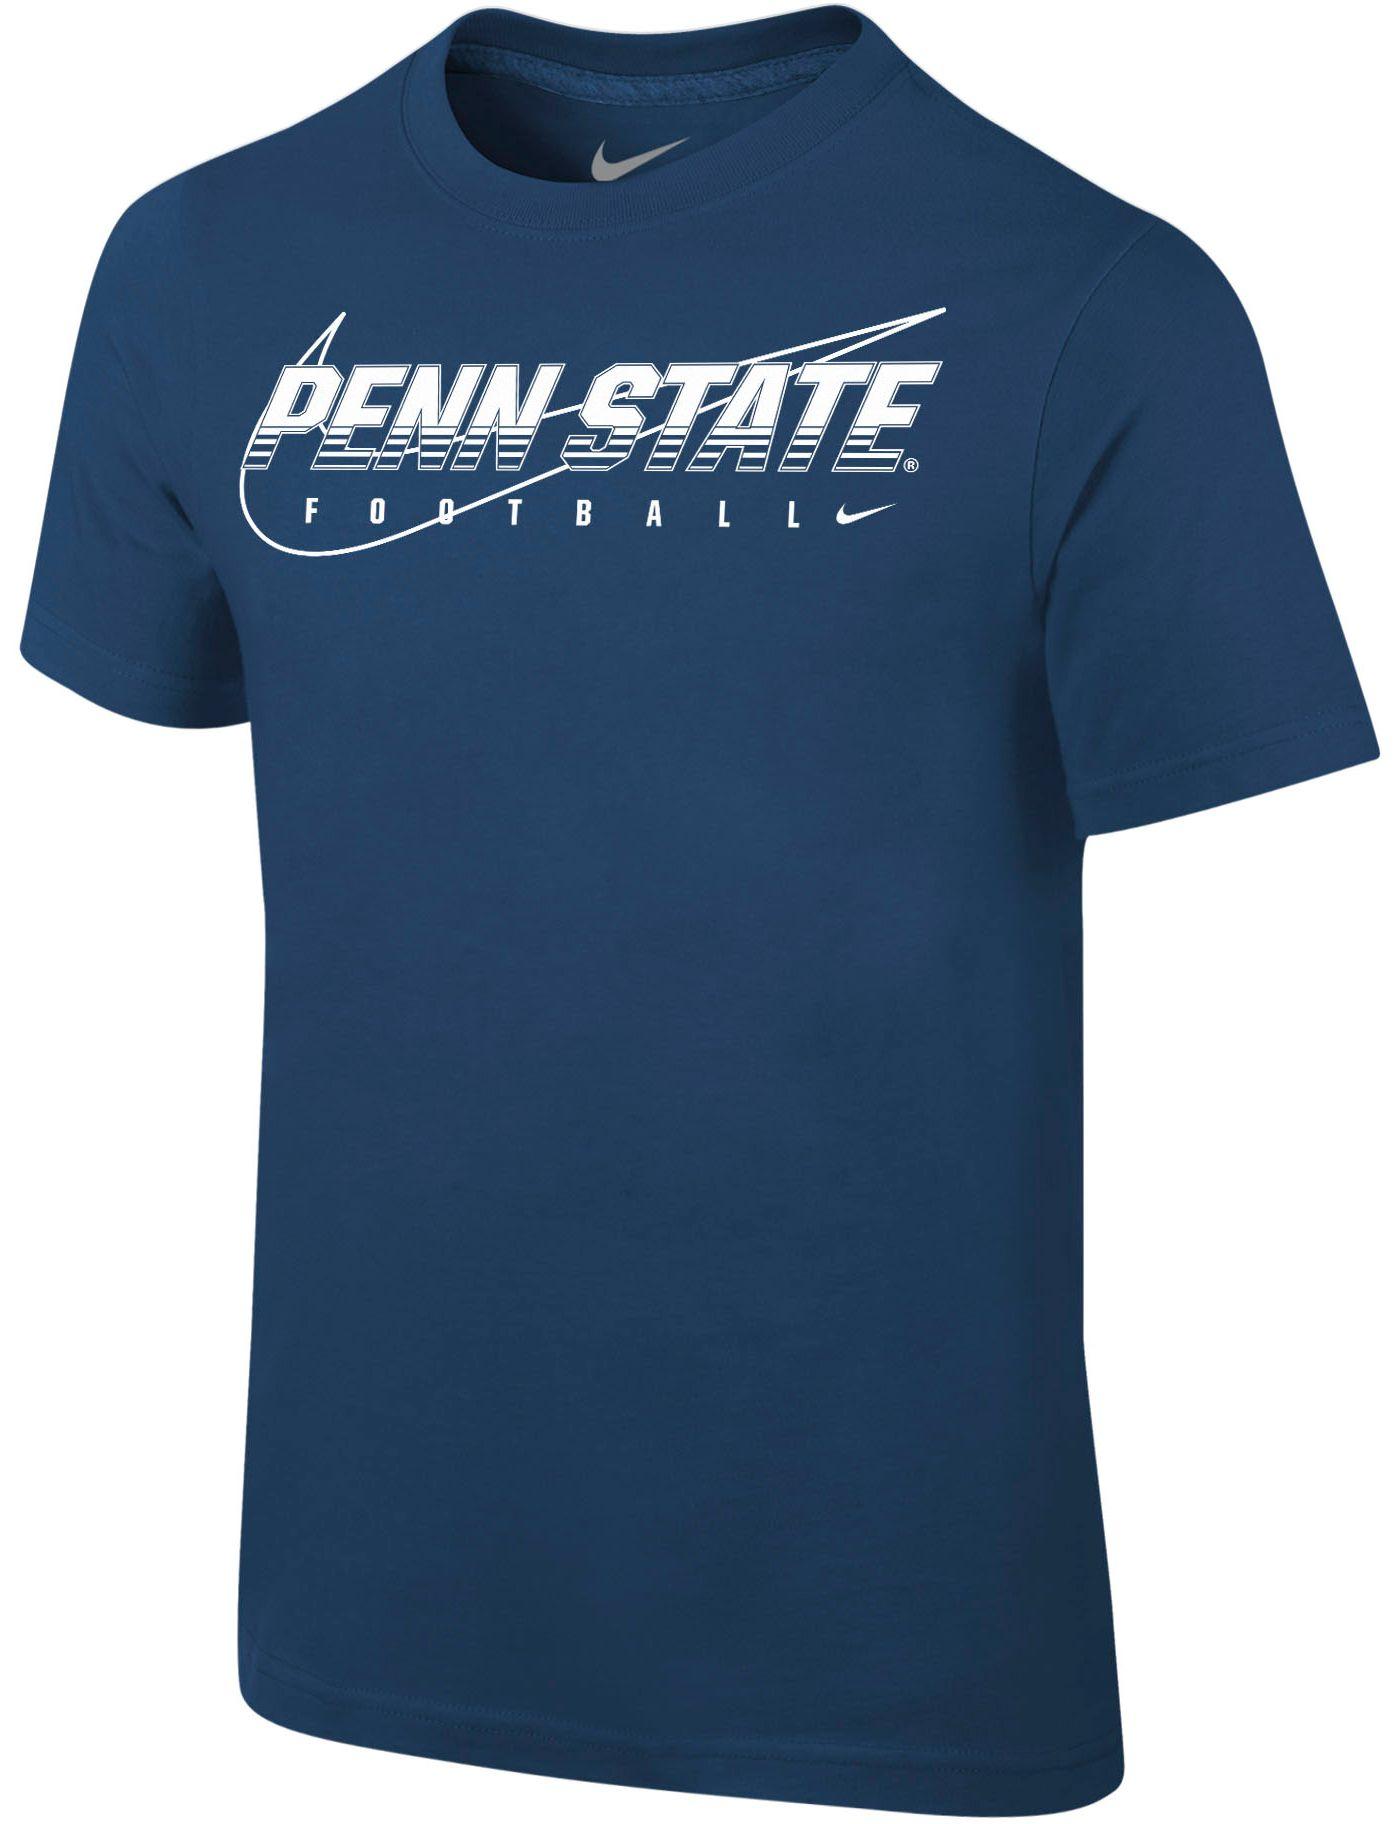 Nike Youth Penn State Nittany Lions Blue Football Dri-FIT Cotton Preschool Facility T-Shirt